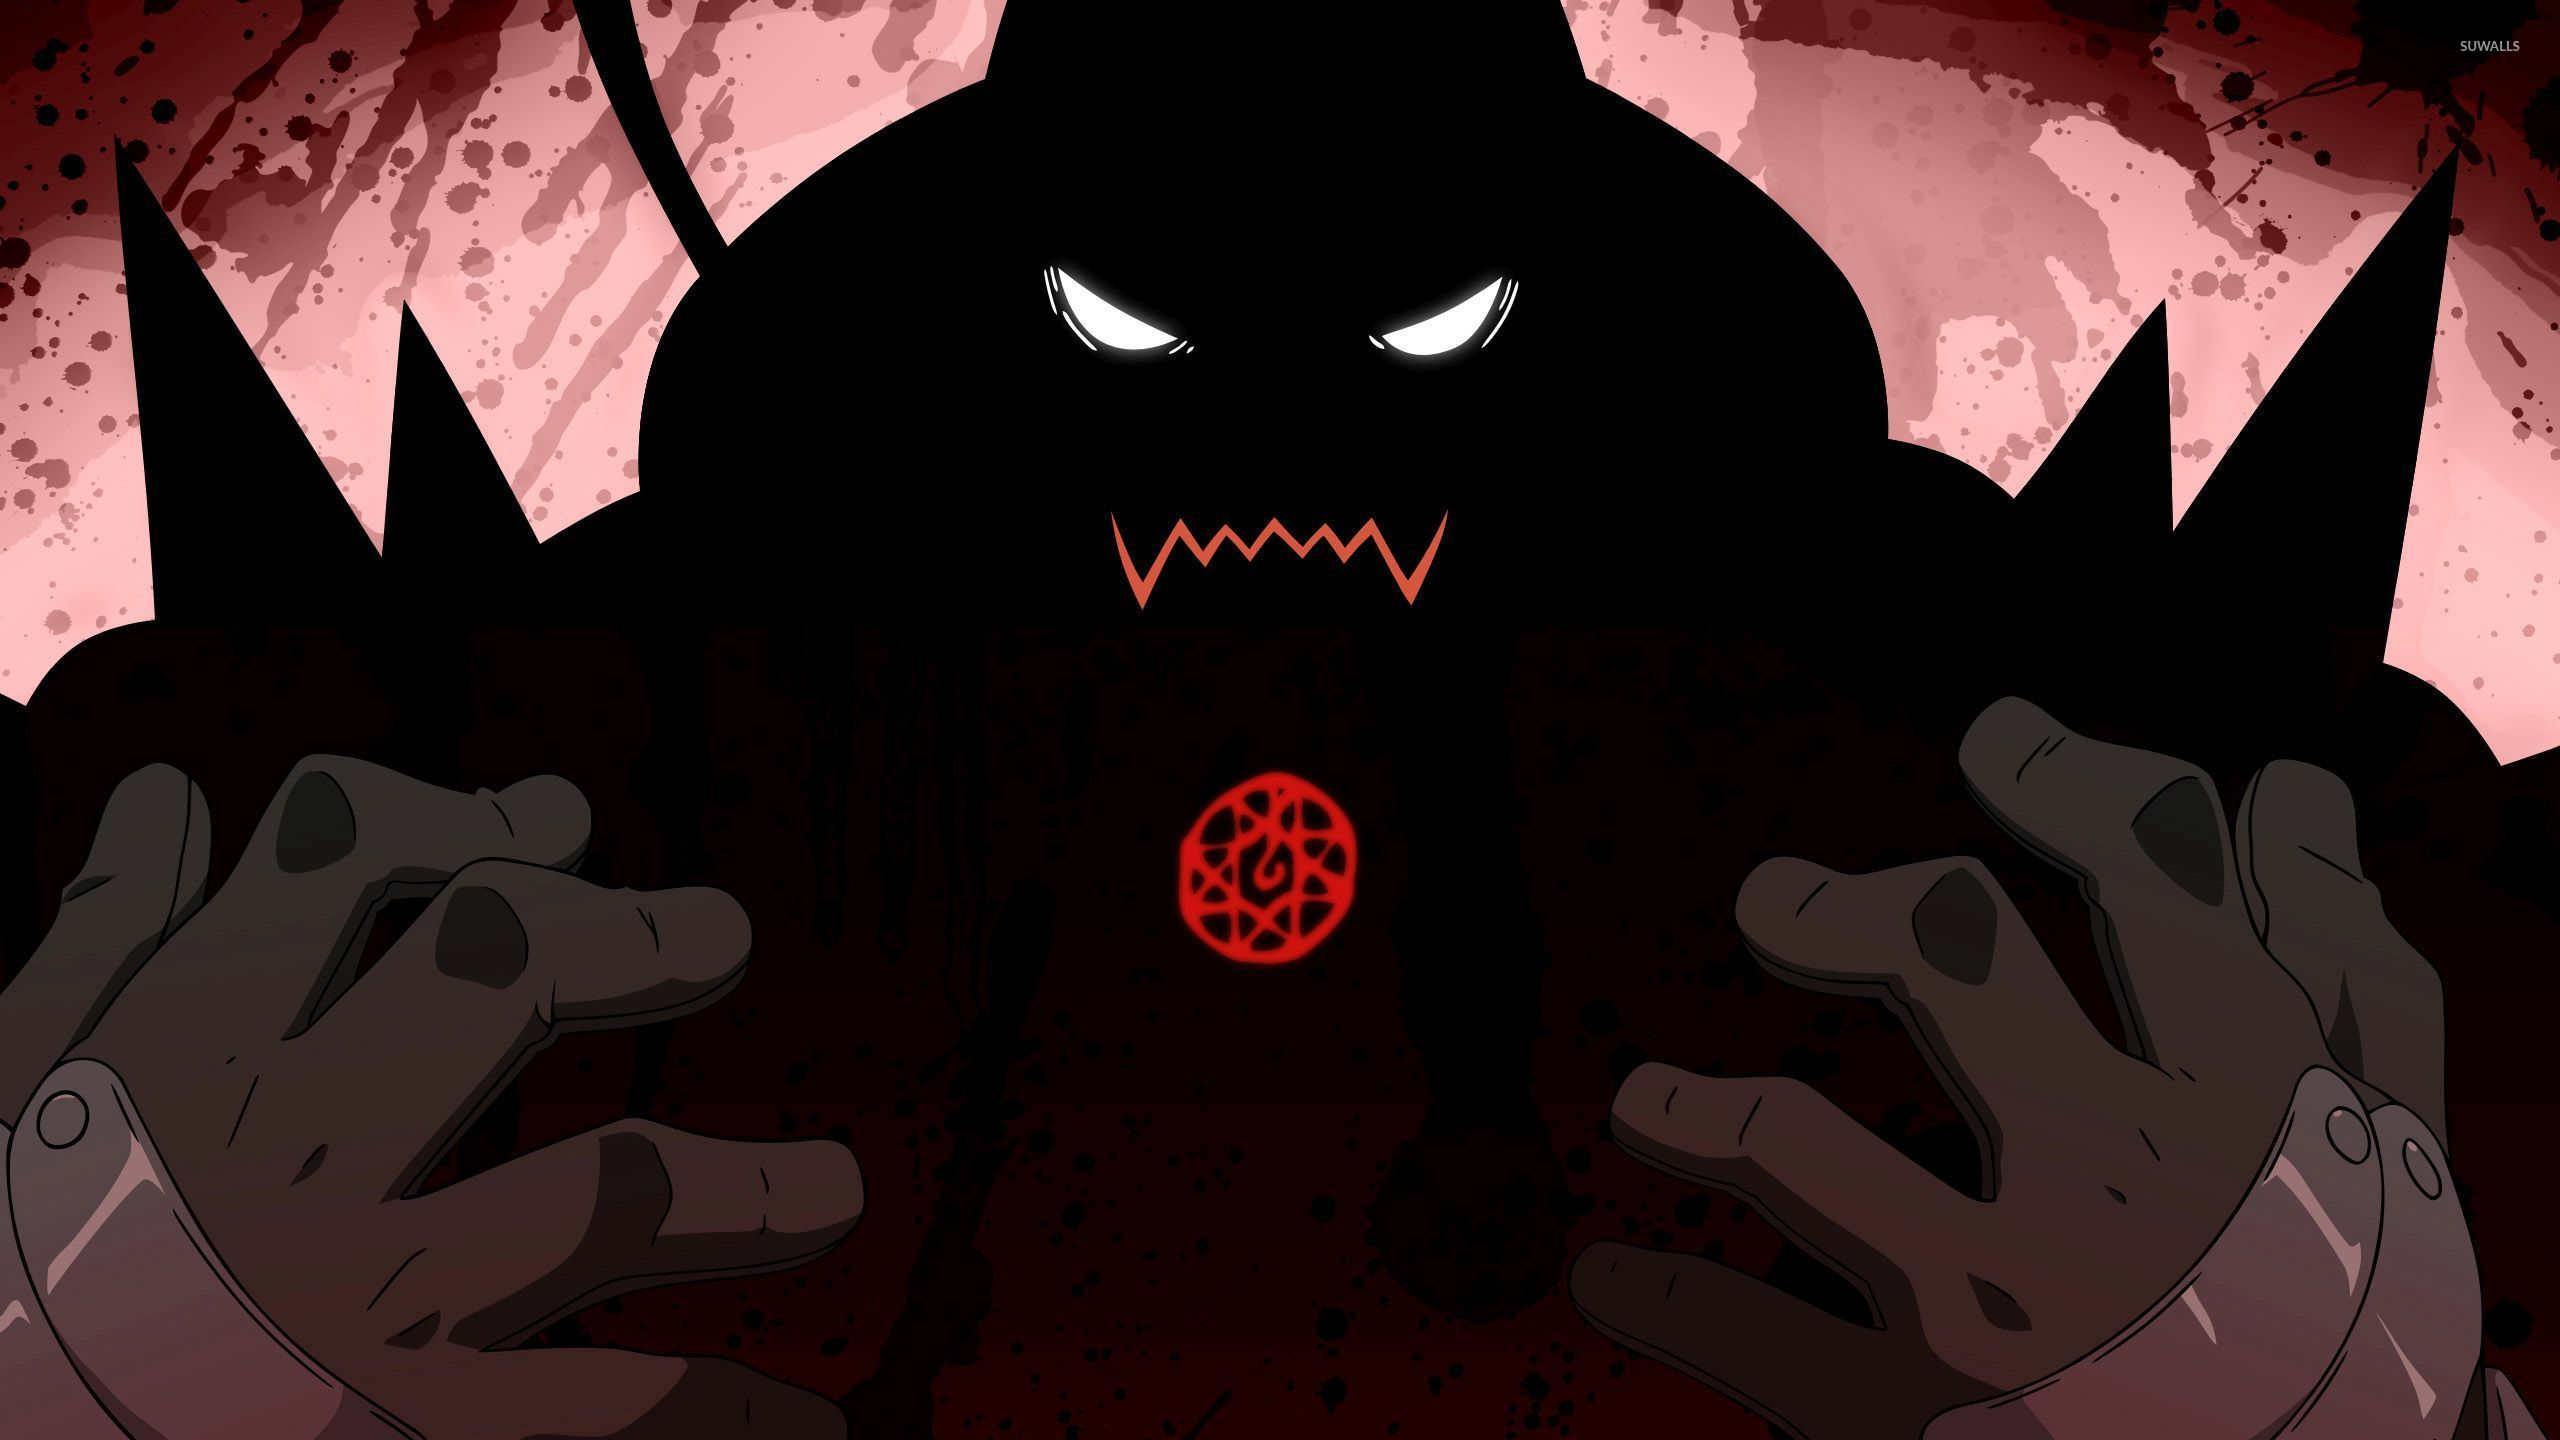 Free Download Alphonse Elric Fullmetal Alchemist Wallpaper Anime